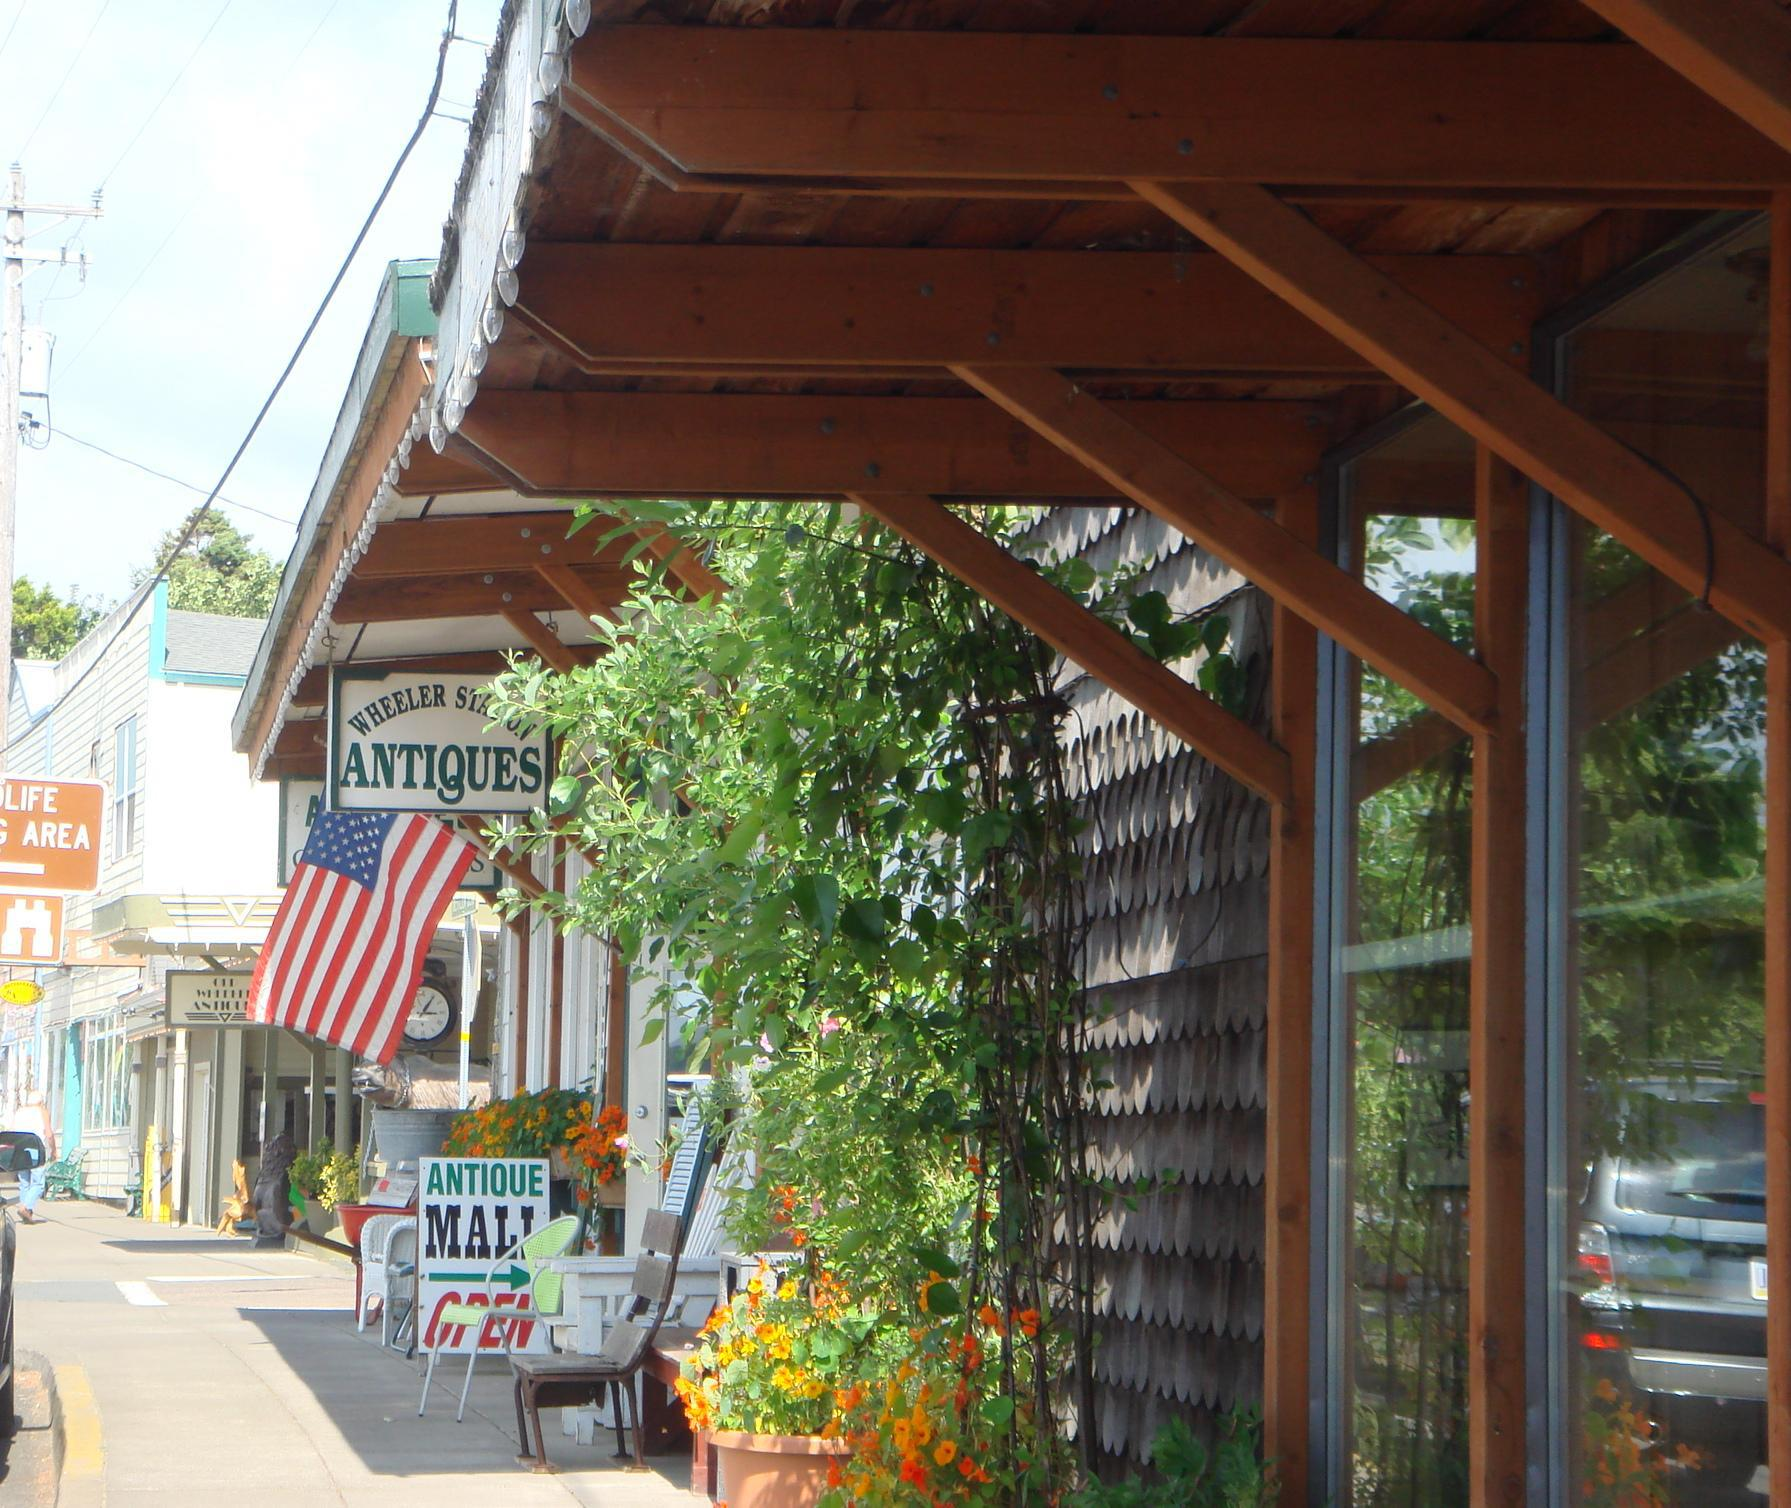 Wheeler Station Antiques.jpg